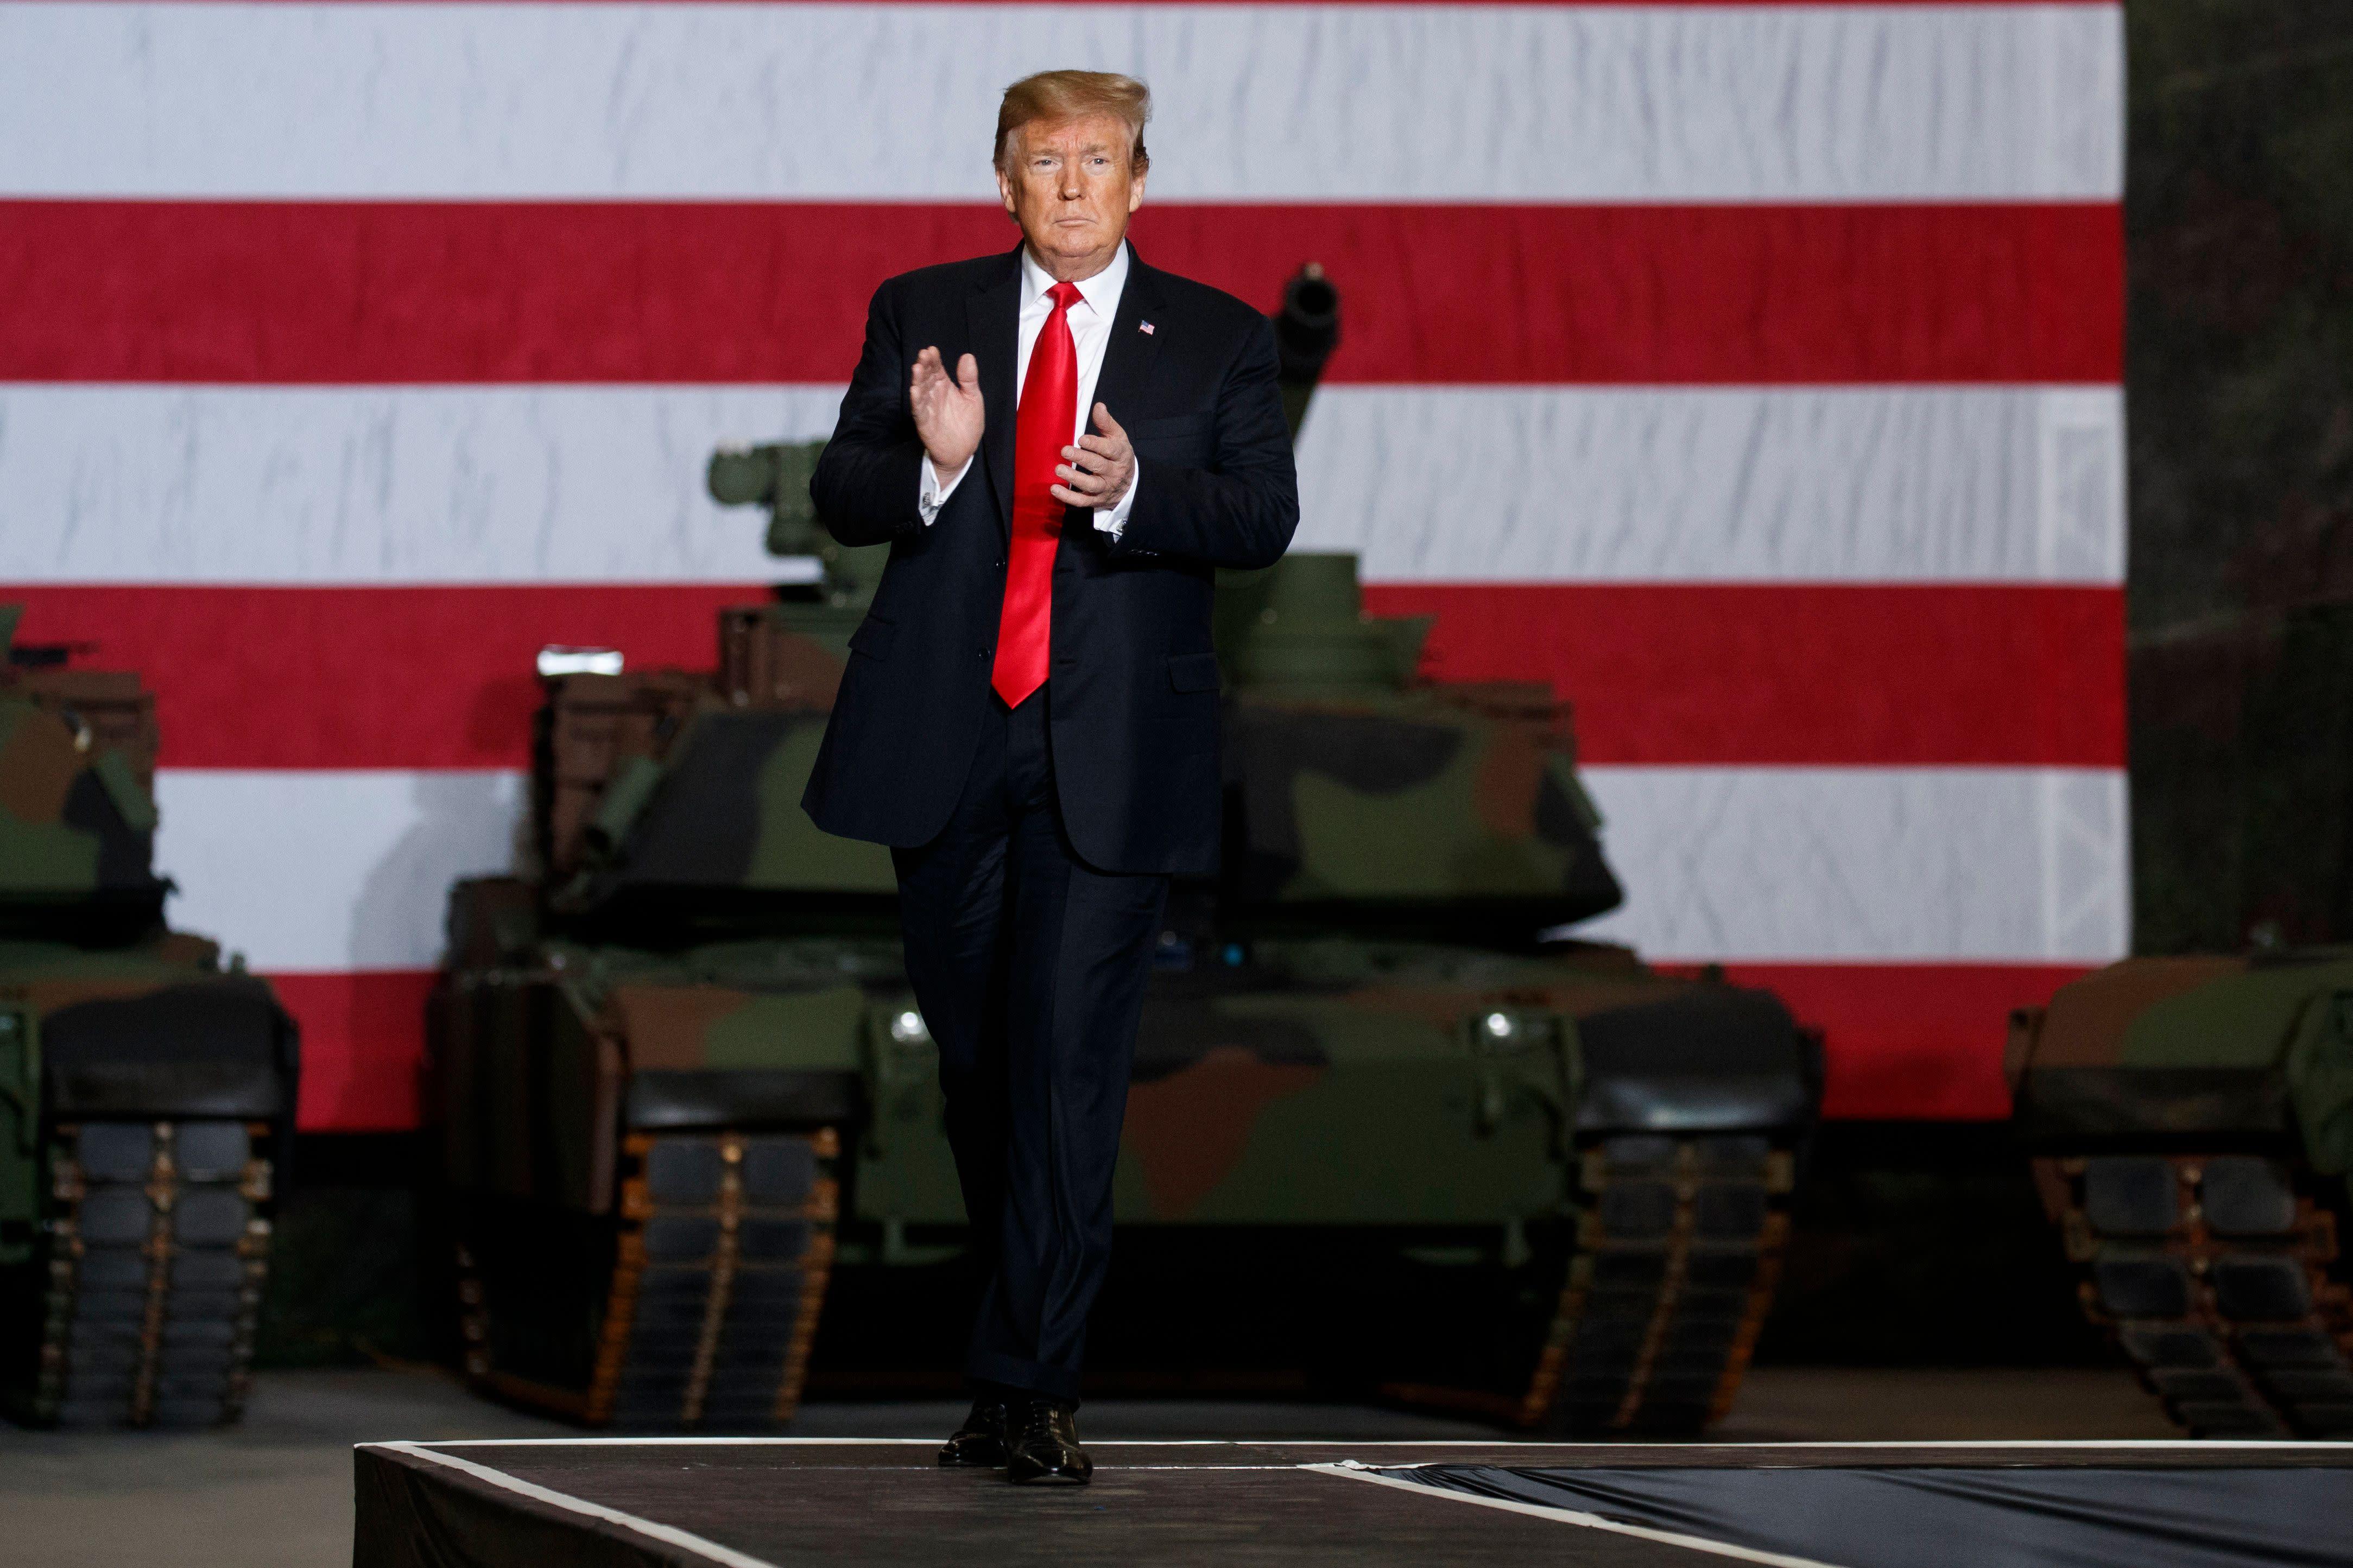 Trump visits tank factory and renews attack on war hero McCain